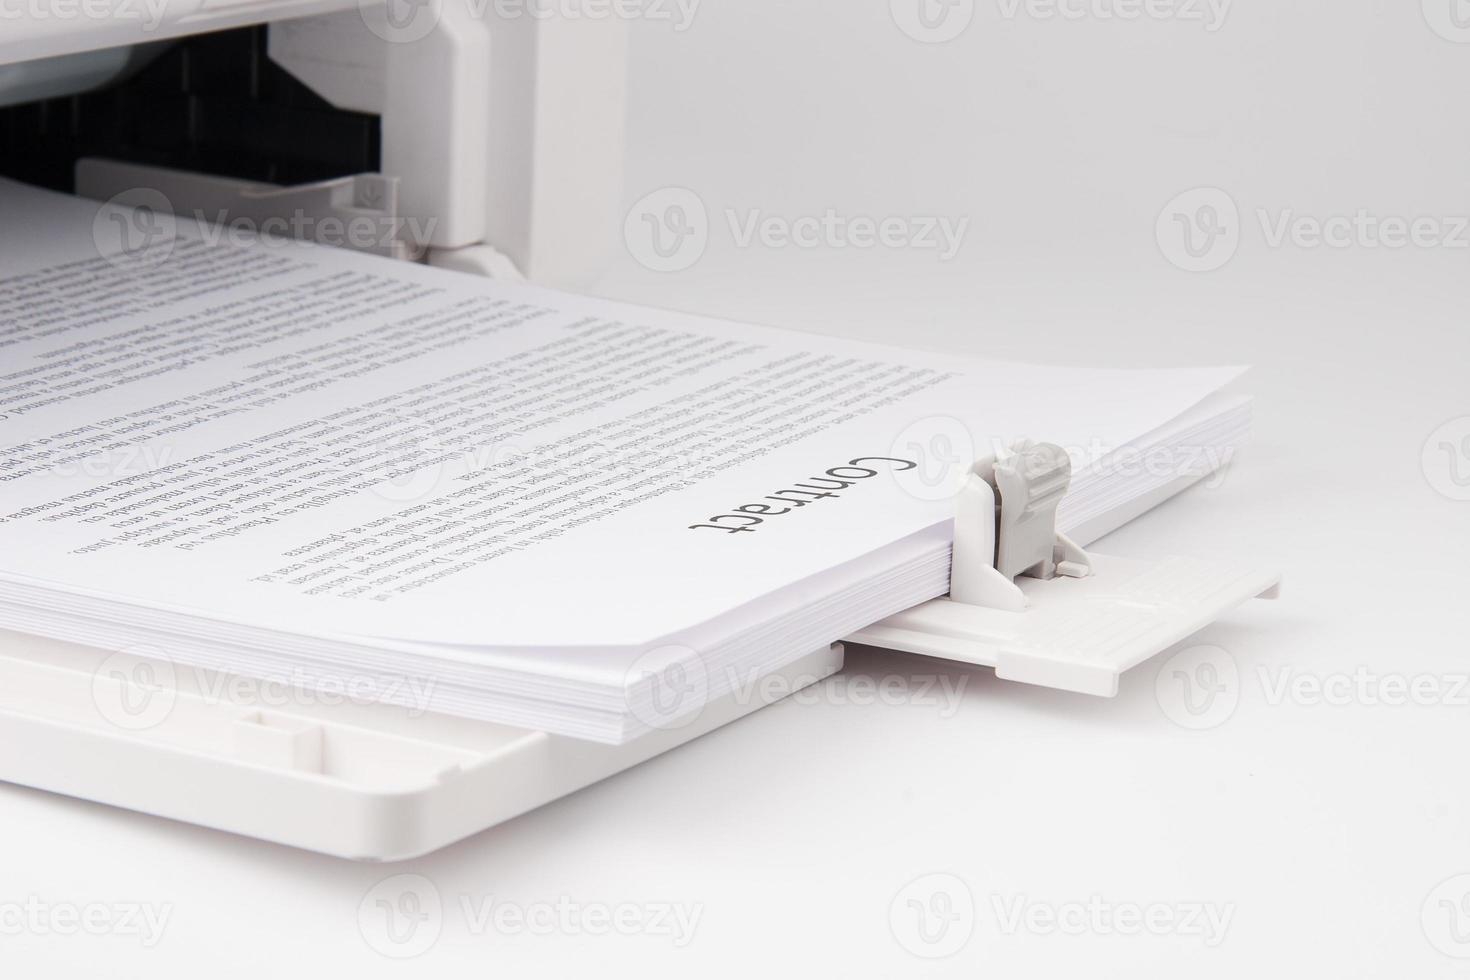 moderna stampante laserjet foto